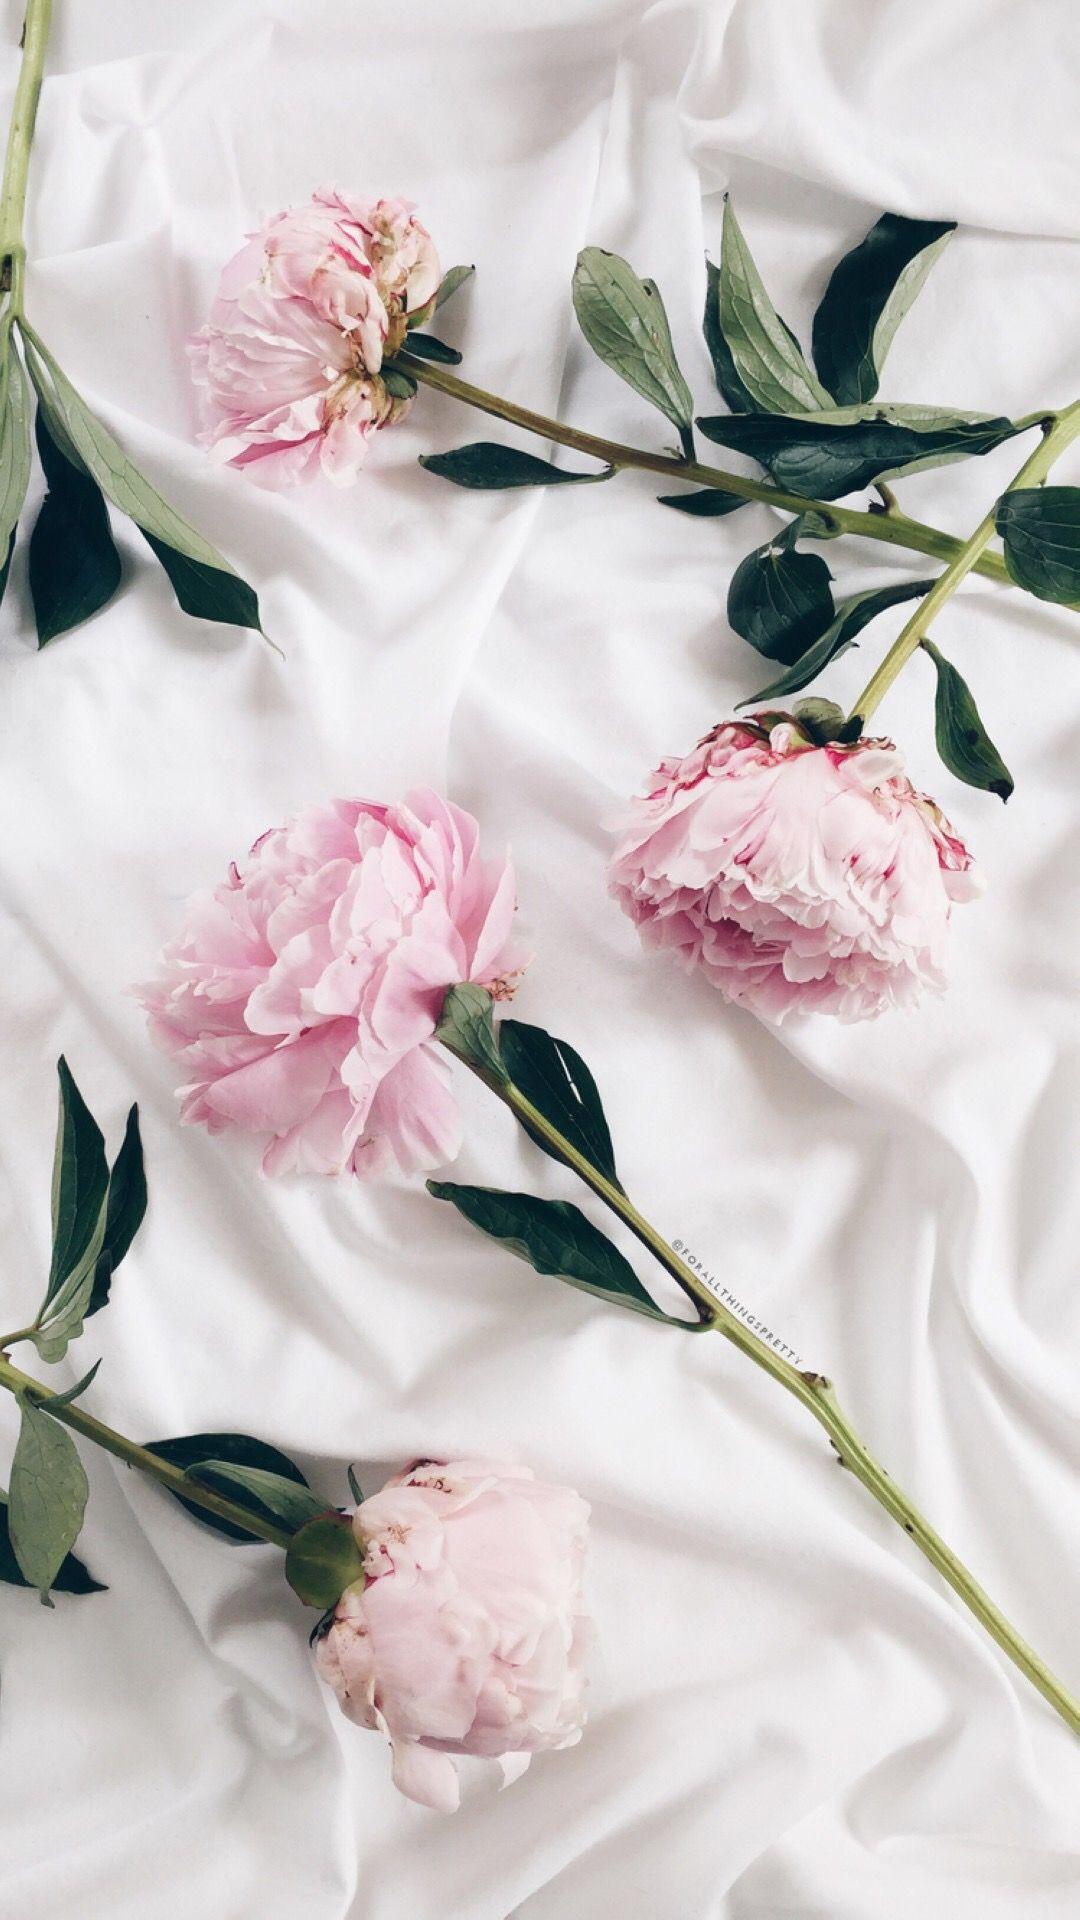 Flores Sfondi iphone, Sfondi floreali, Sfondi per iphone